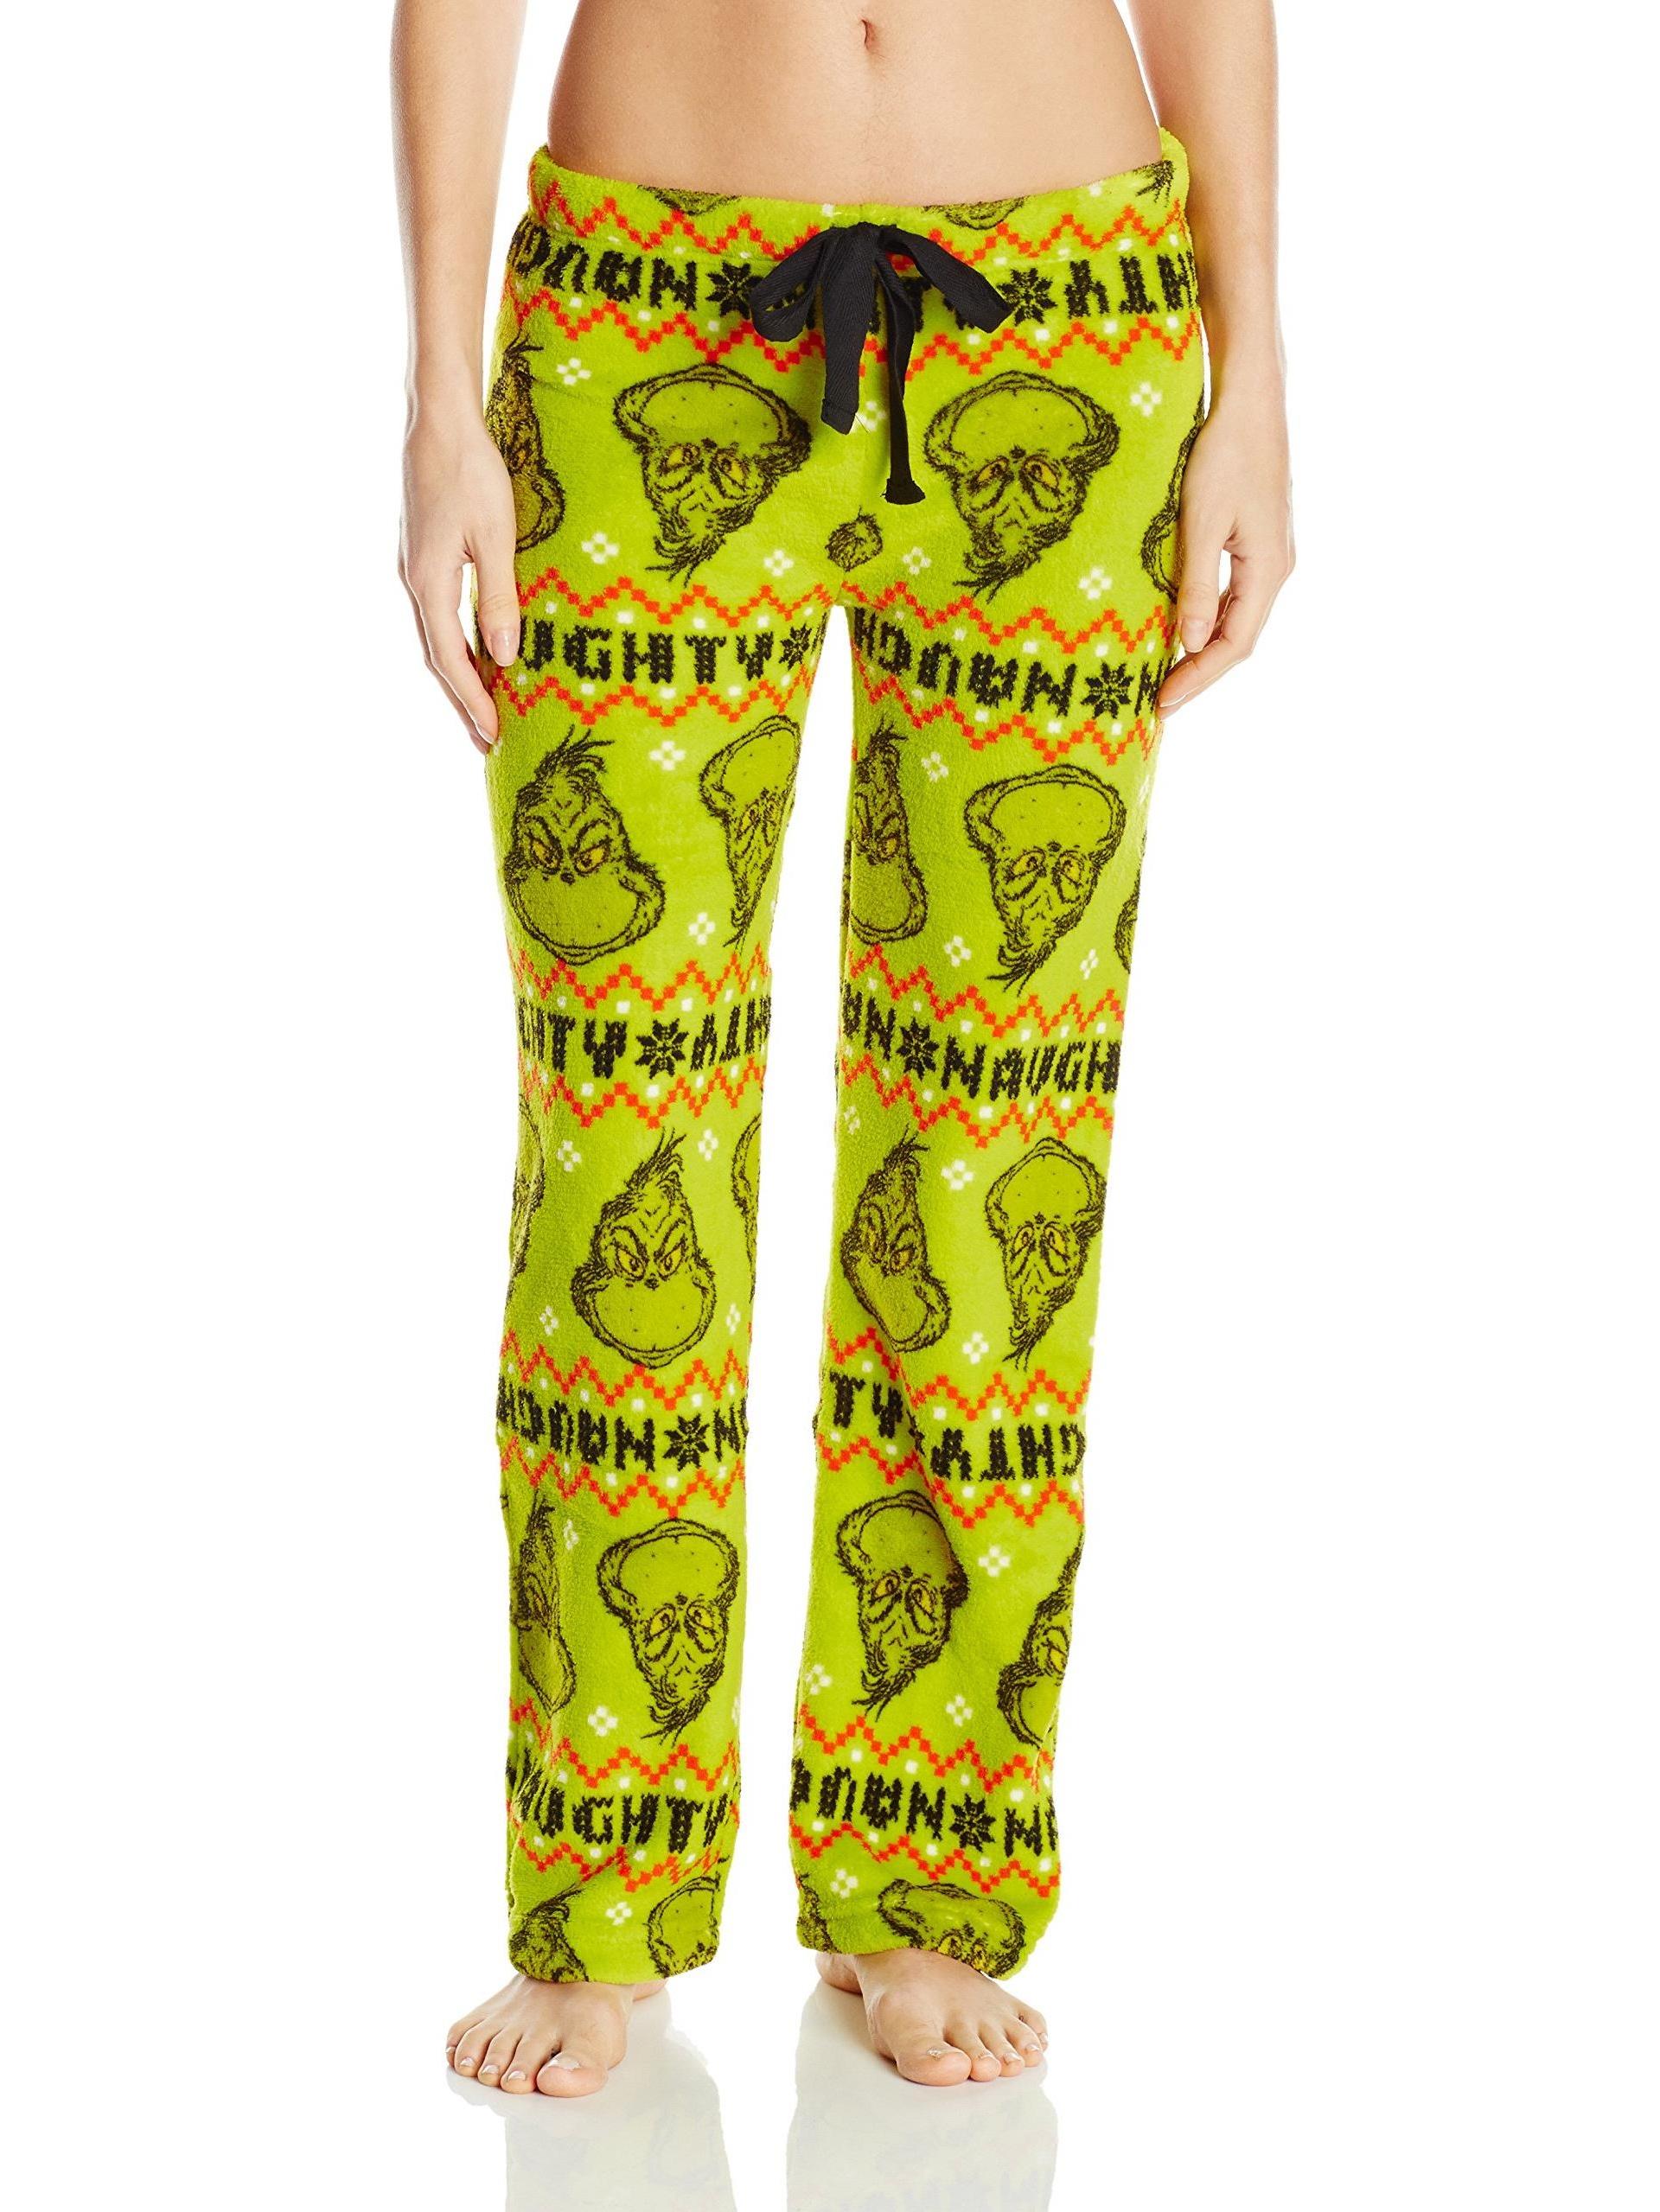 Dr.Seuss Women's Naughty Grinch Fairisle Plush Pant, Green, Size: Medium